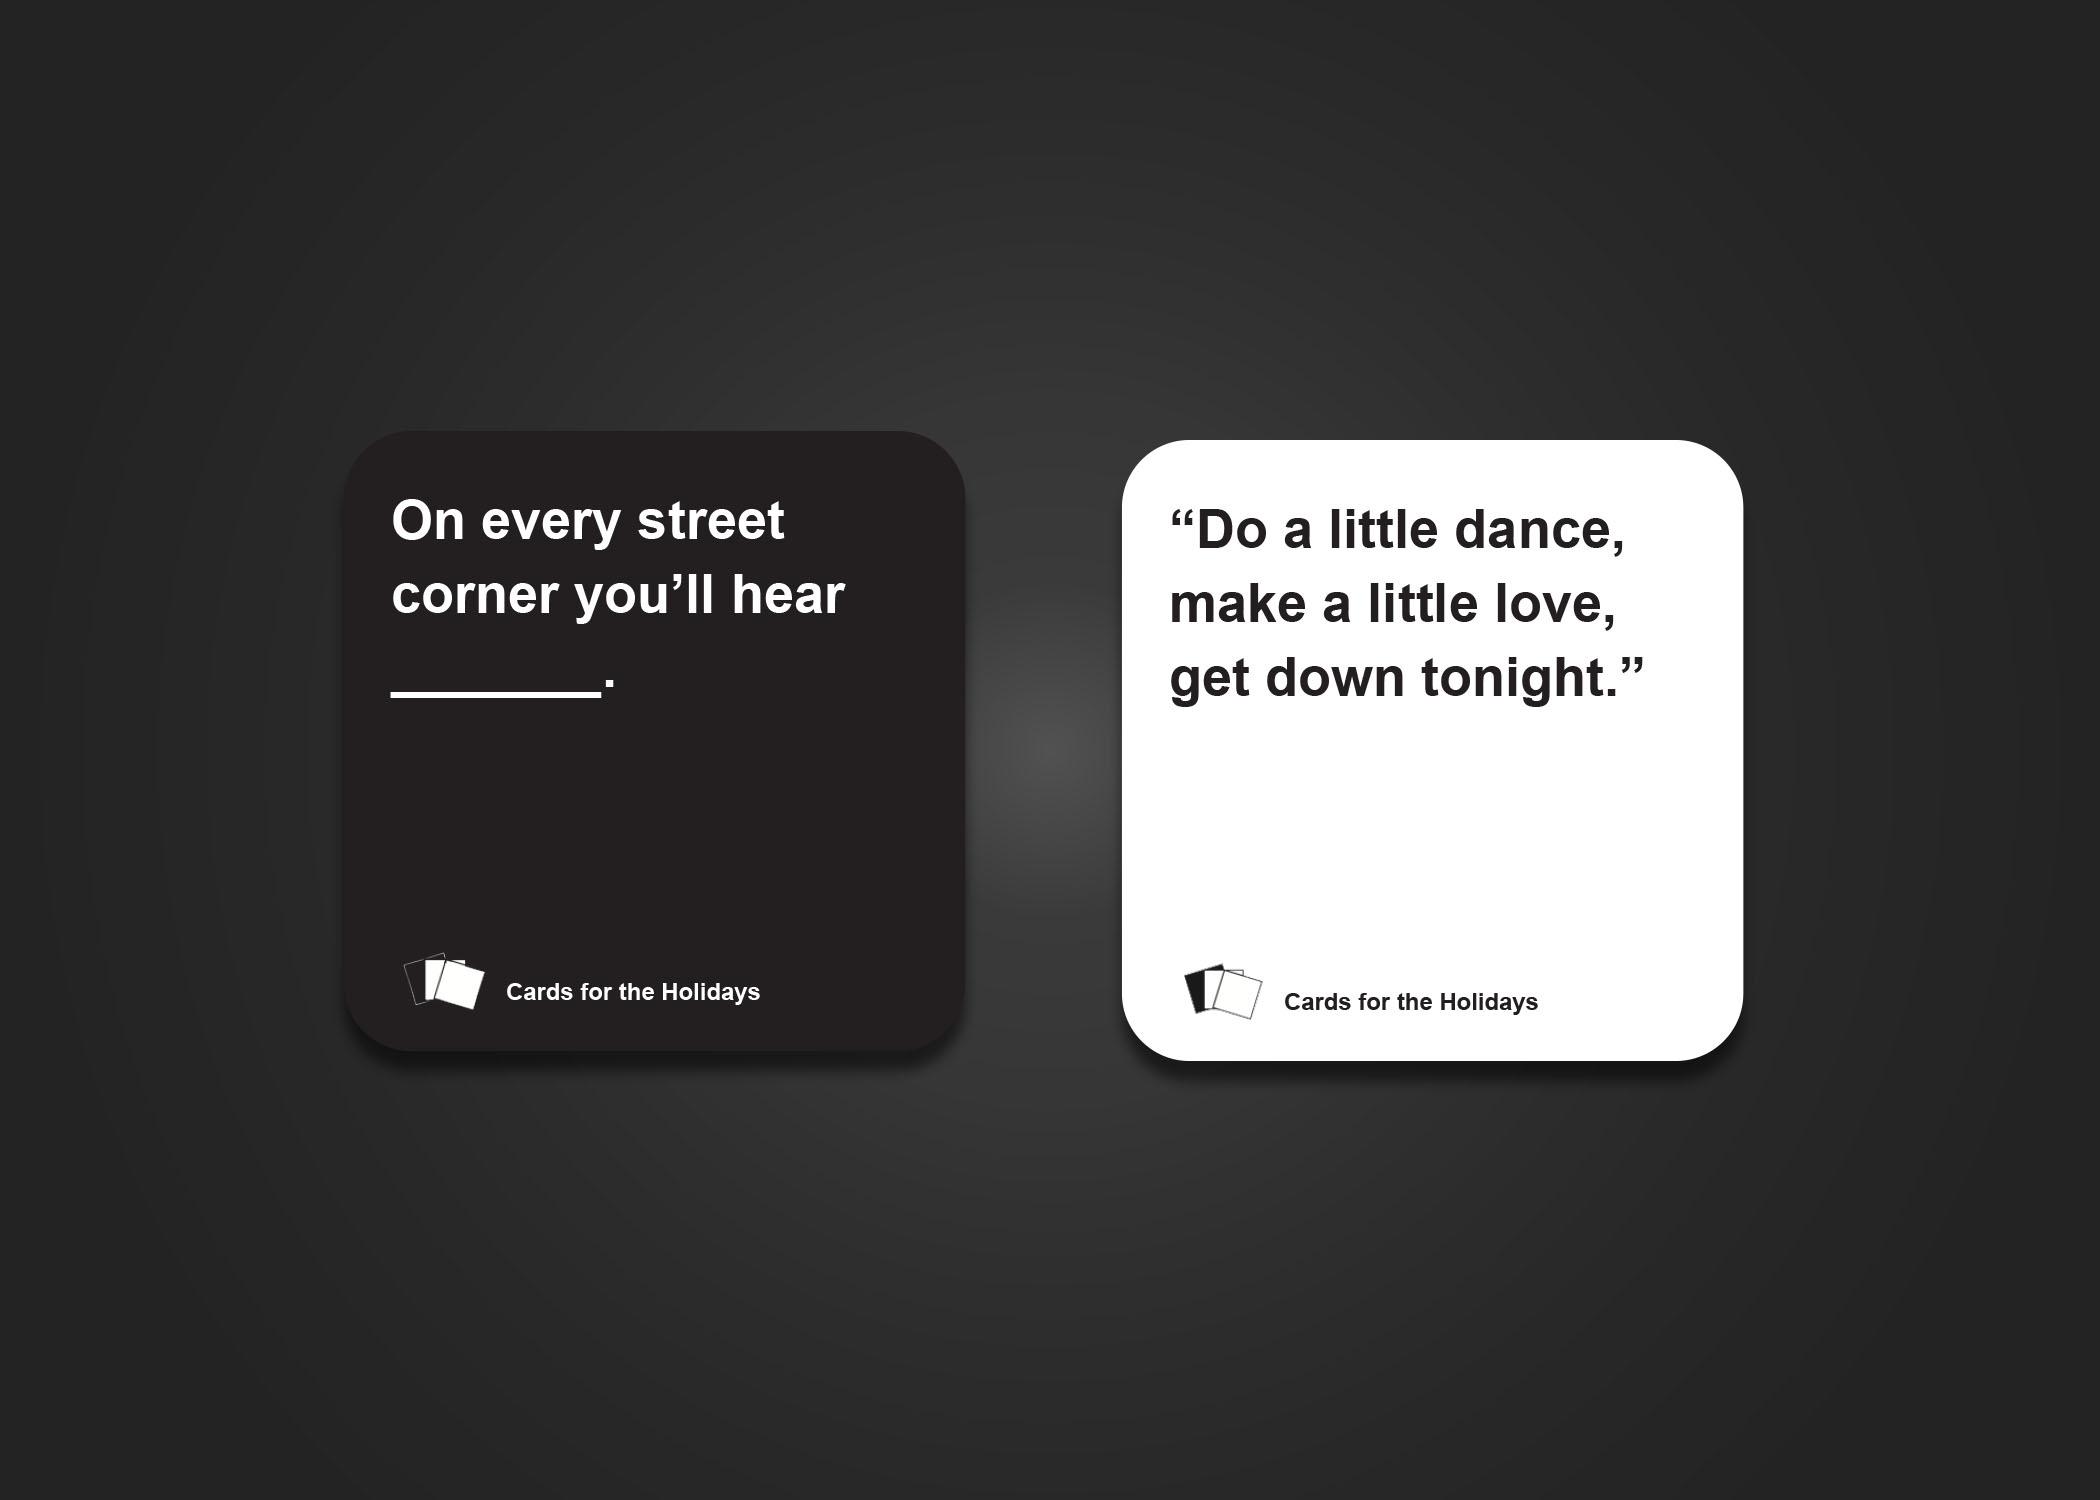 CardPairing_StreetCorner.jpg